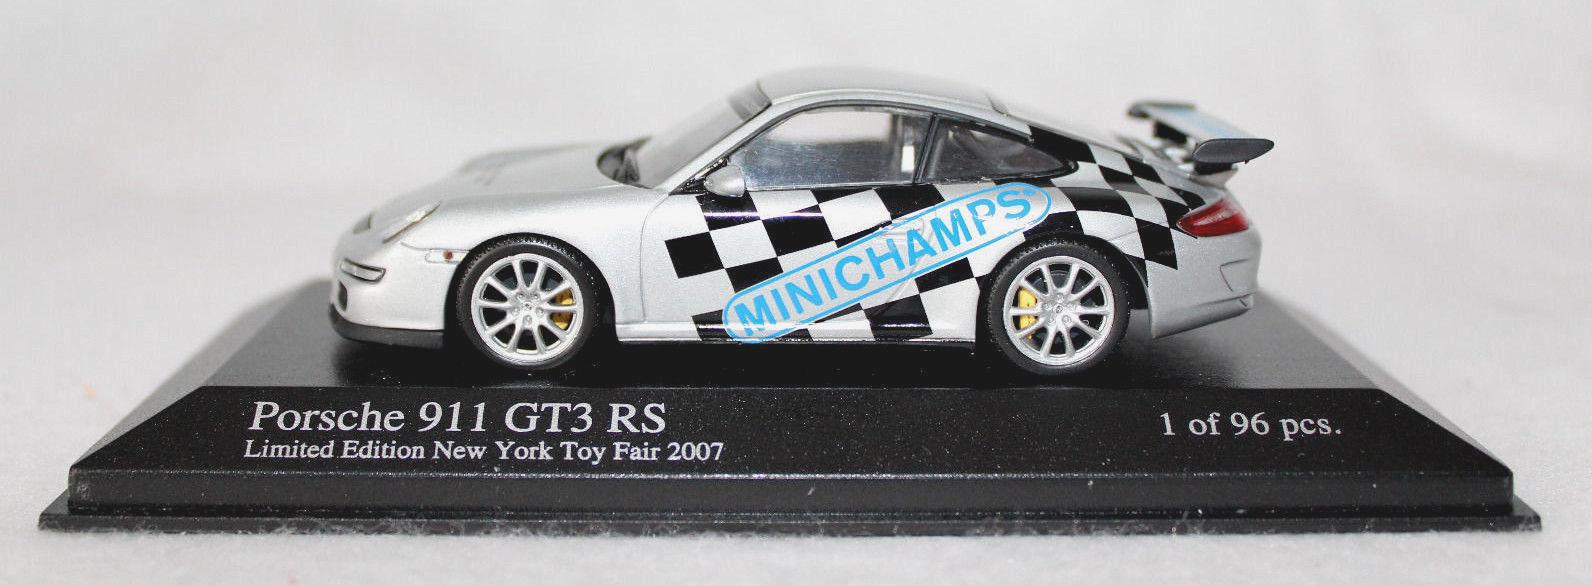 MINICHAMPS 1 43rd Scale PORSCHE 911 GT3 RS, New York Toy Fair, 2007